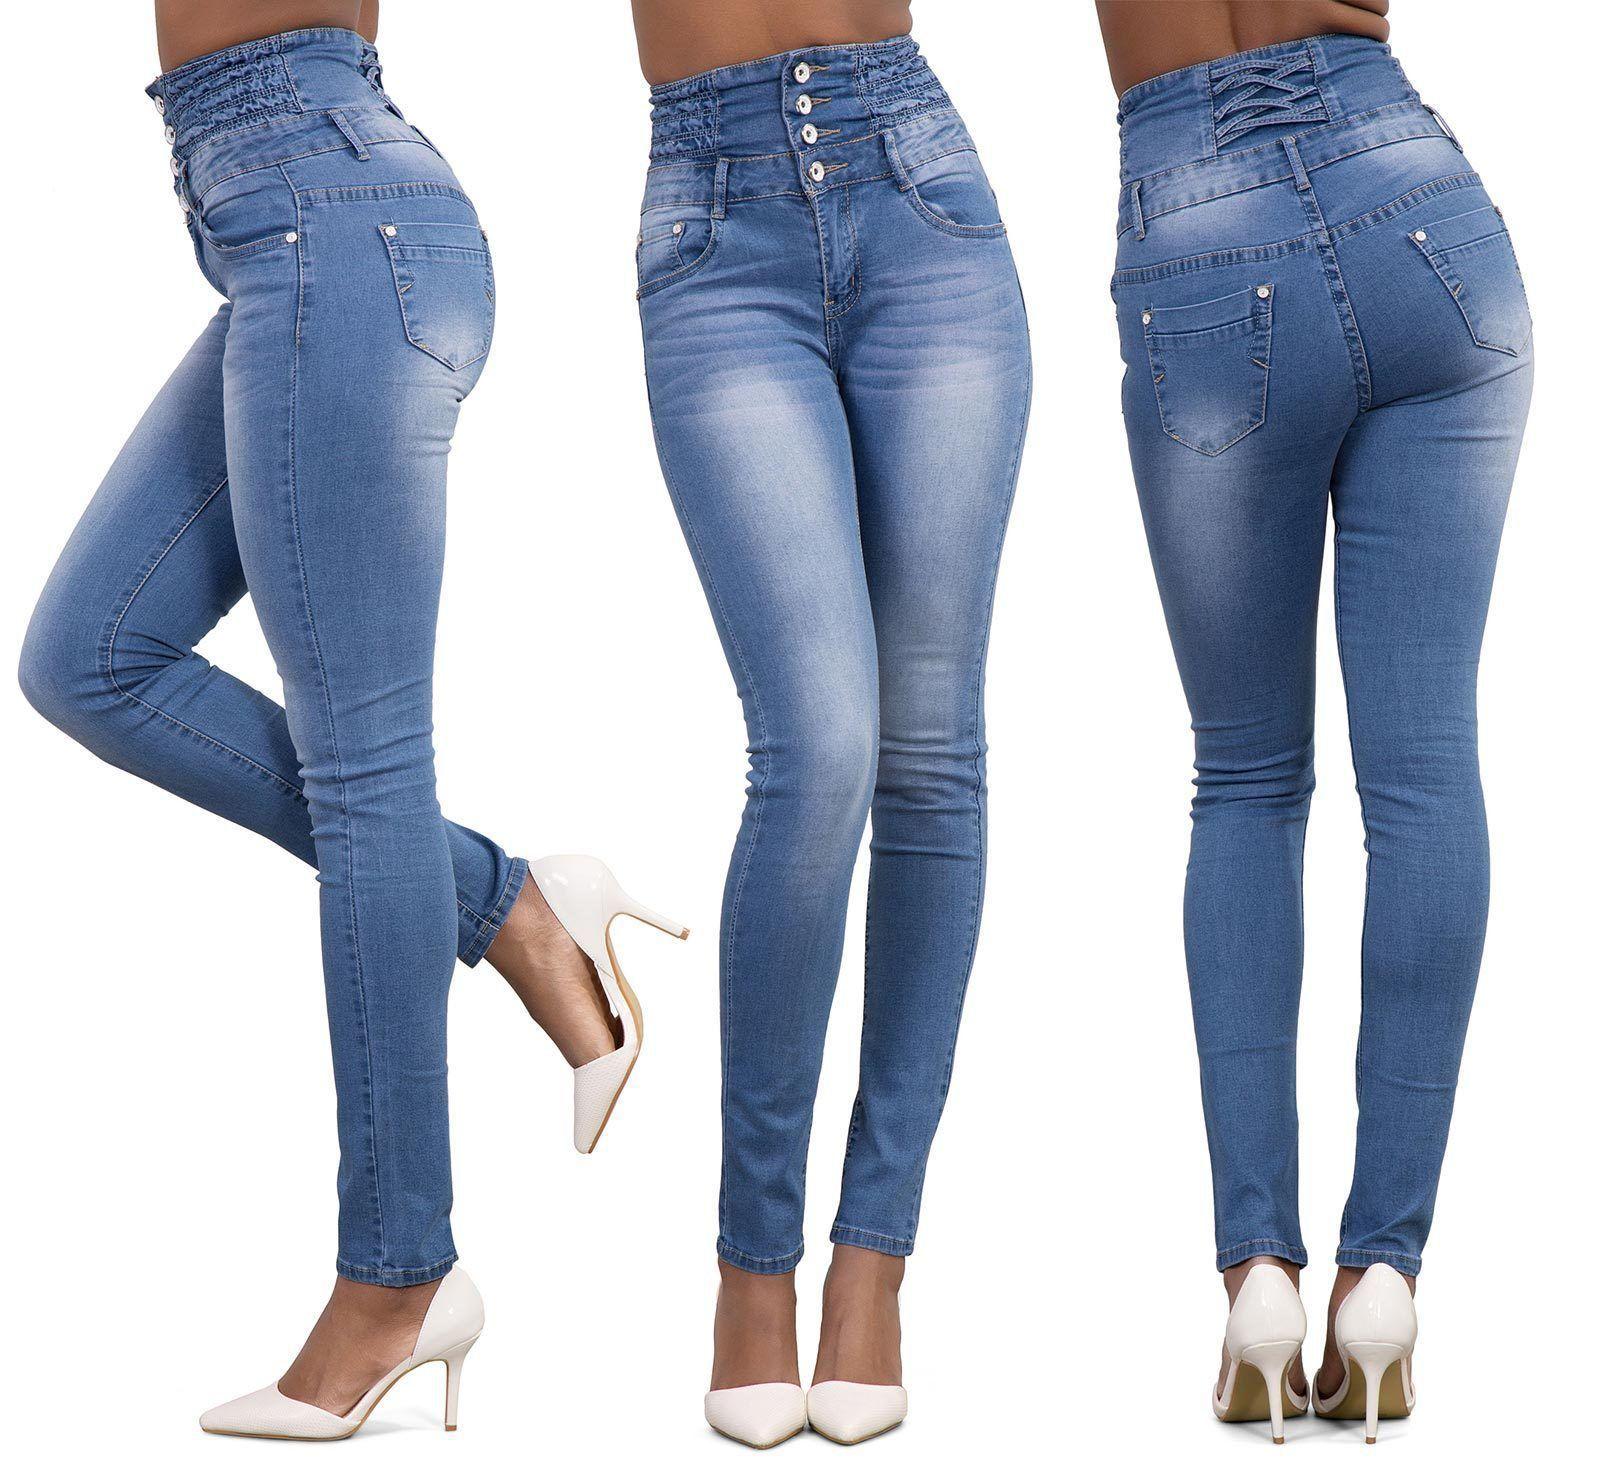 48565f9dd5e0f Autumn Sexy Skinny Jeans Women High Waisted Stretch Slim Fit Denim Pants  Denim Straight Skinny Jeans Black Light Blue S-2XL Sexy Skinny Jeans Women  High ...